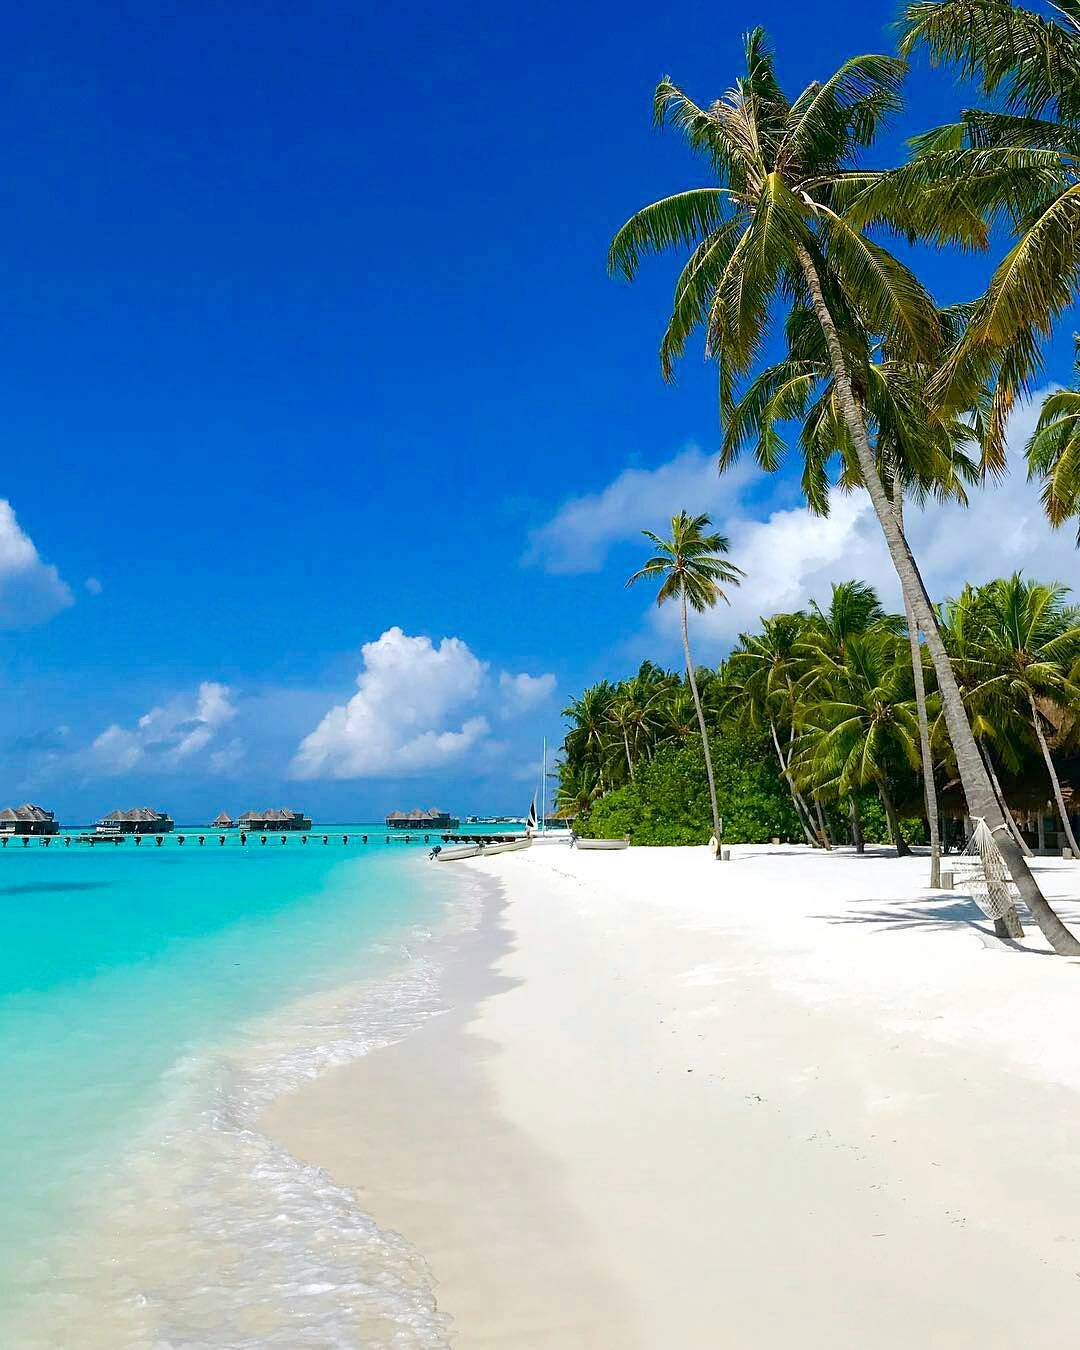 Island Beach Wallpaper: Maldives - Repinned By @youngandmerri